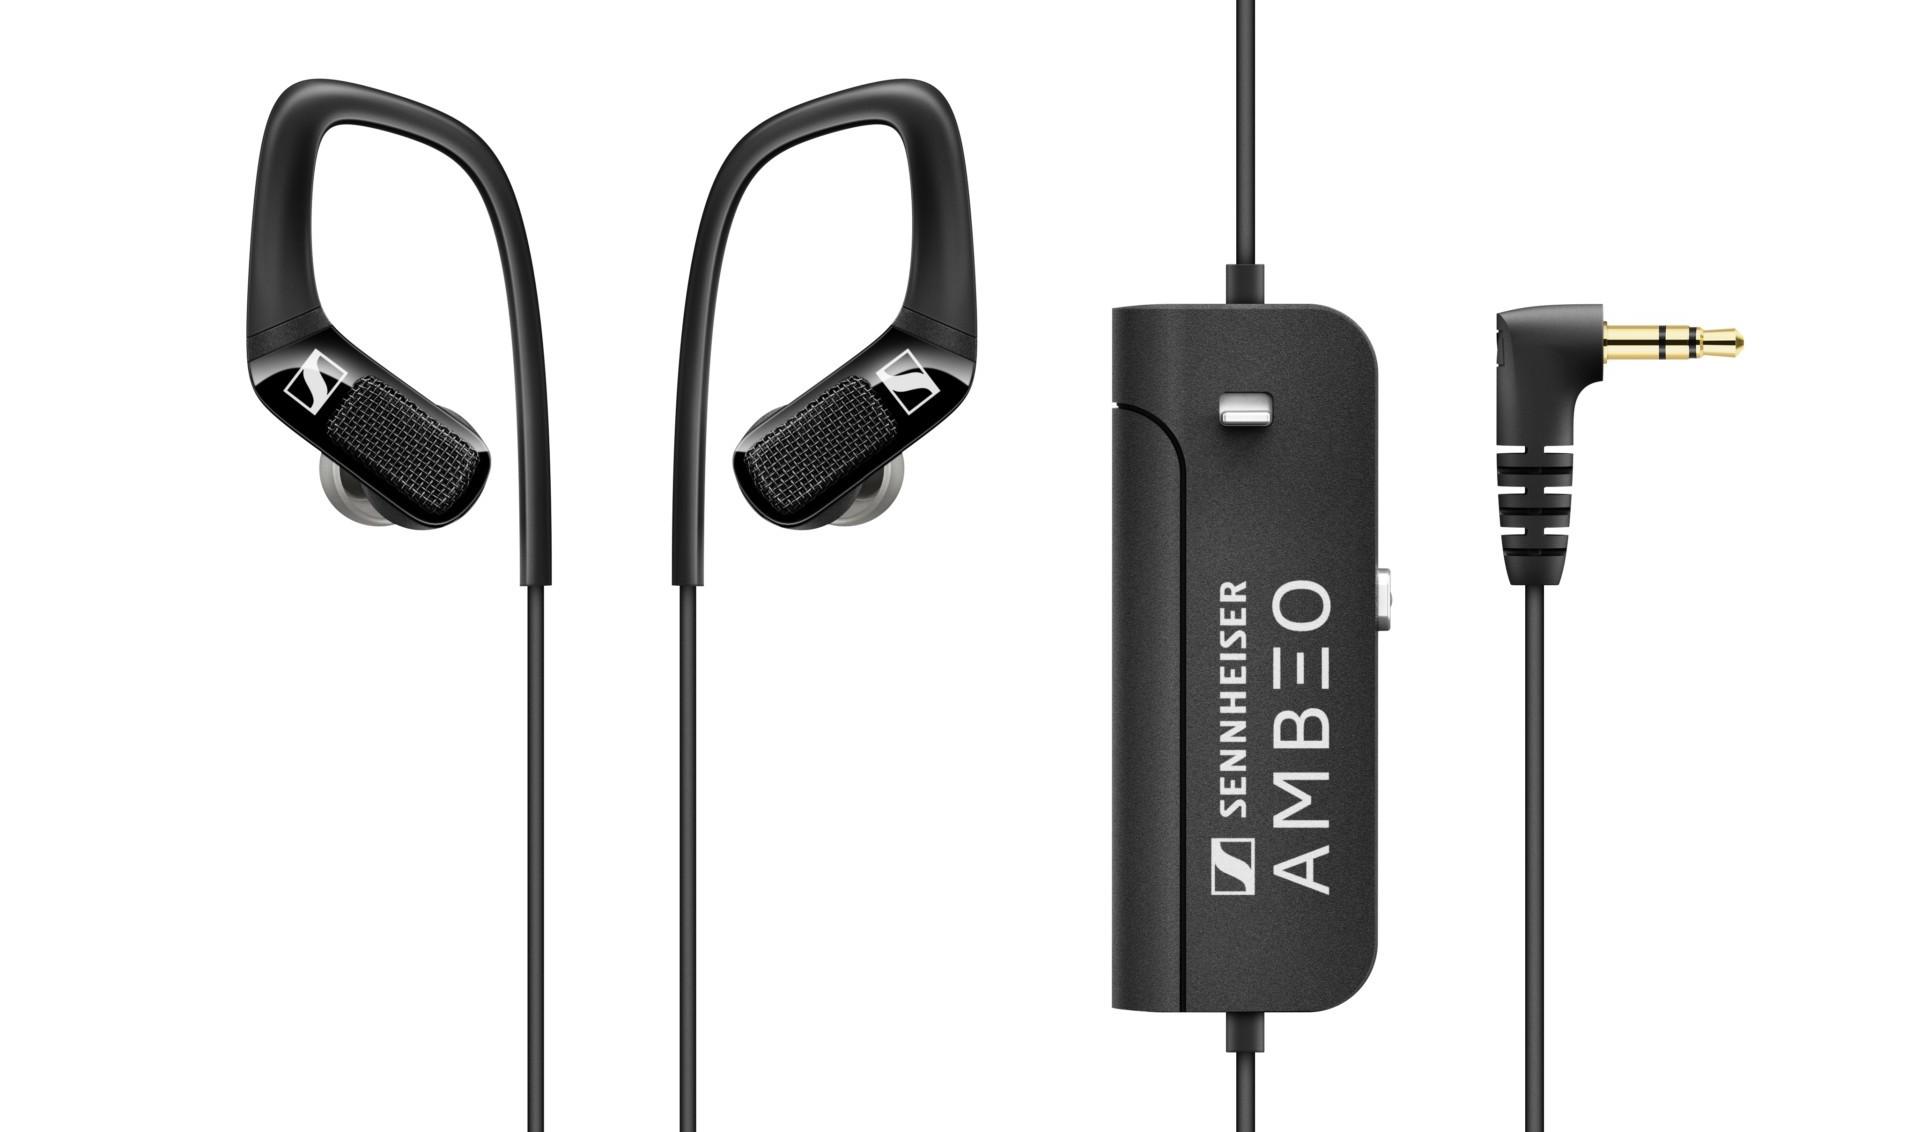 Sennheiser Ambeo AR One earphones product image detailing remote on white background.